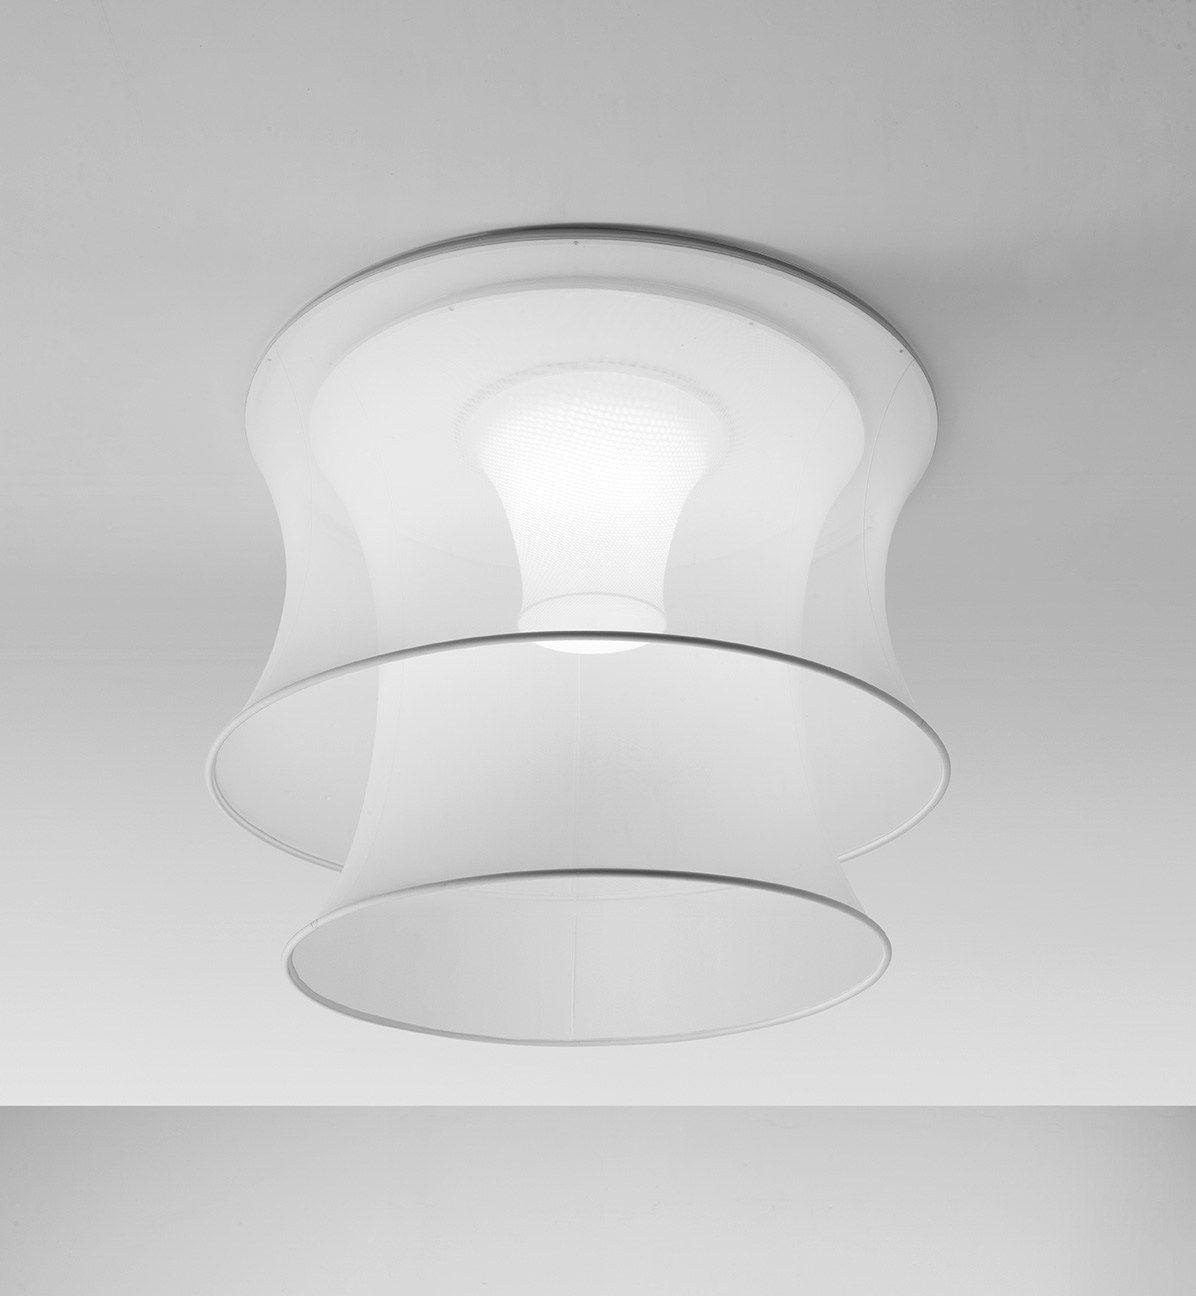 fluorescent fabric ceiling lamp euler by axo light design cambi scatena turini architetti. Black Bedroom Furniture Sets. Home Design Ideas